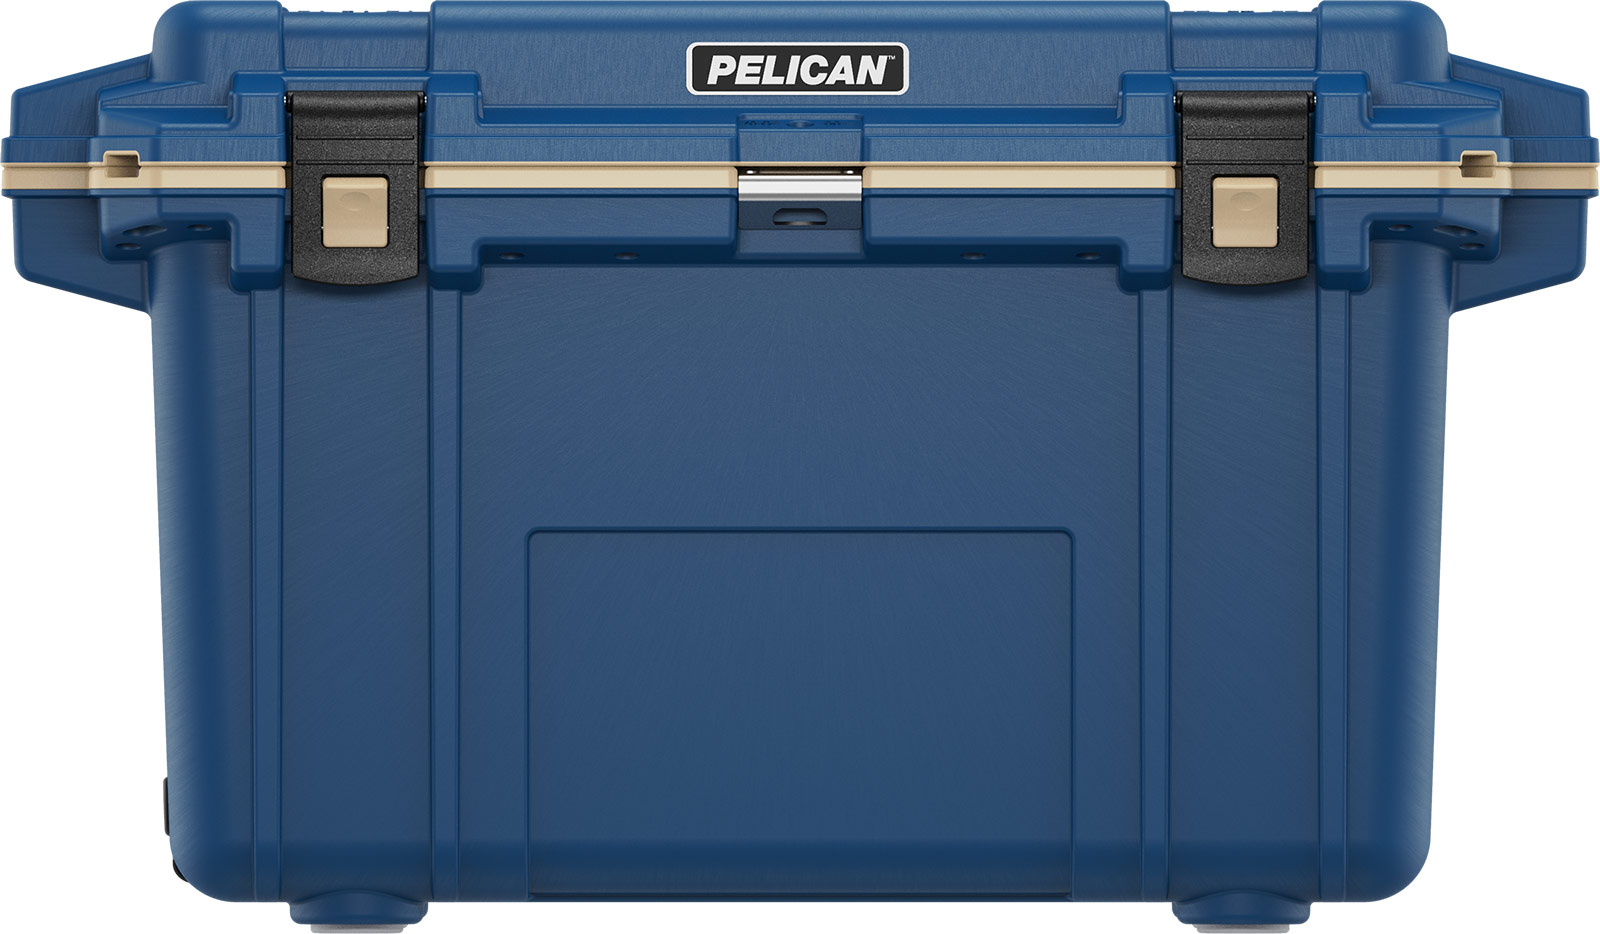 pelican 70qt blue cooler overland coolers